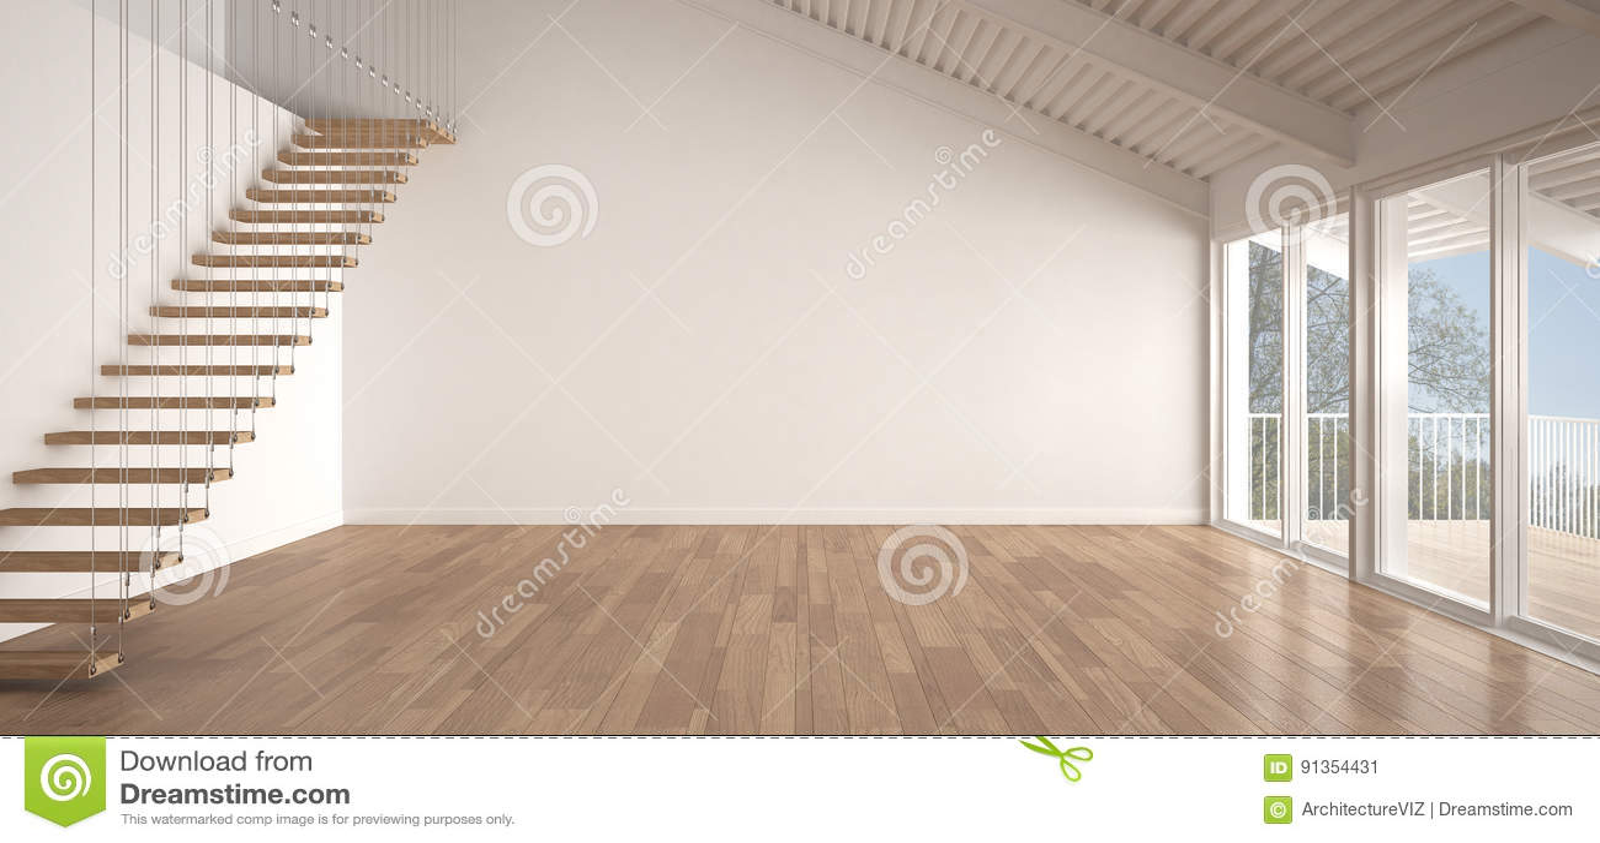 Minimalistische mezzanine zolder lege industriële ruimte